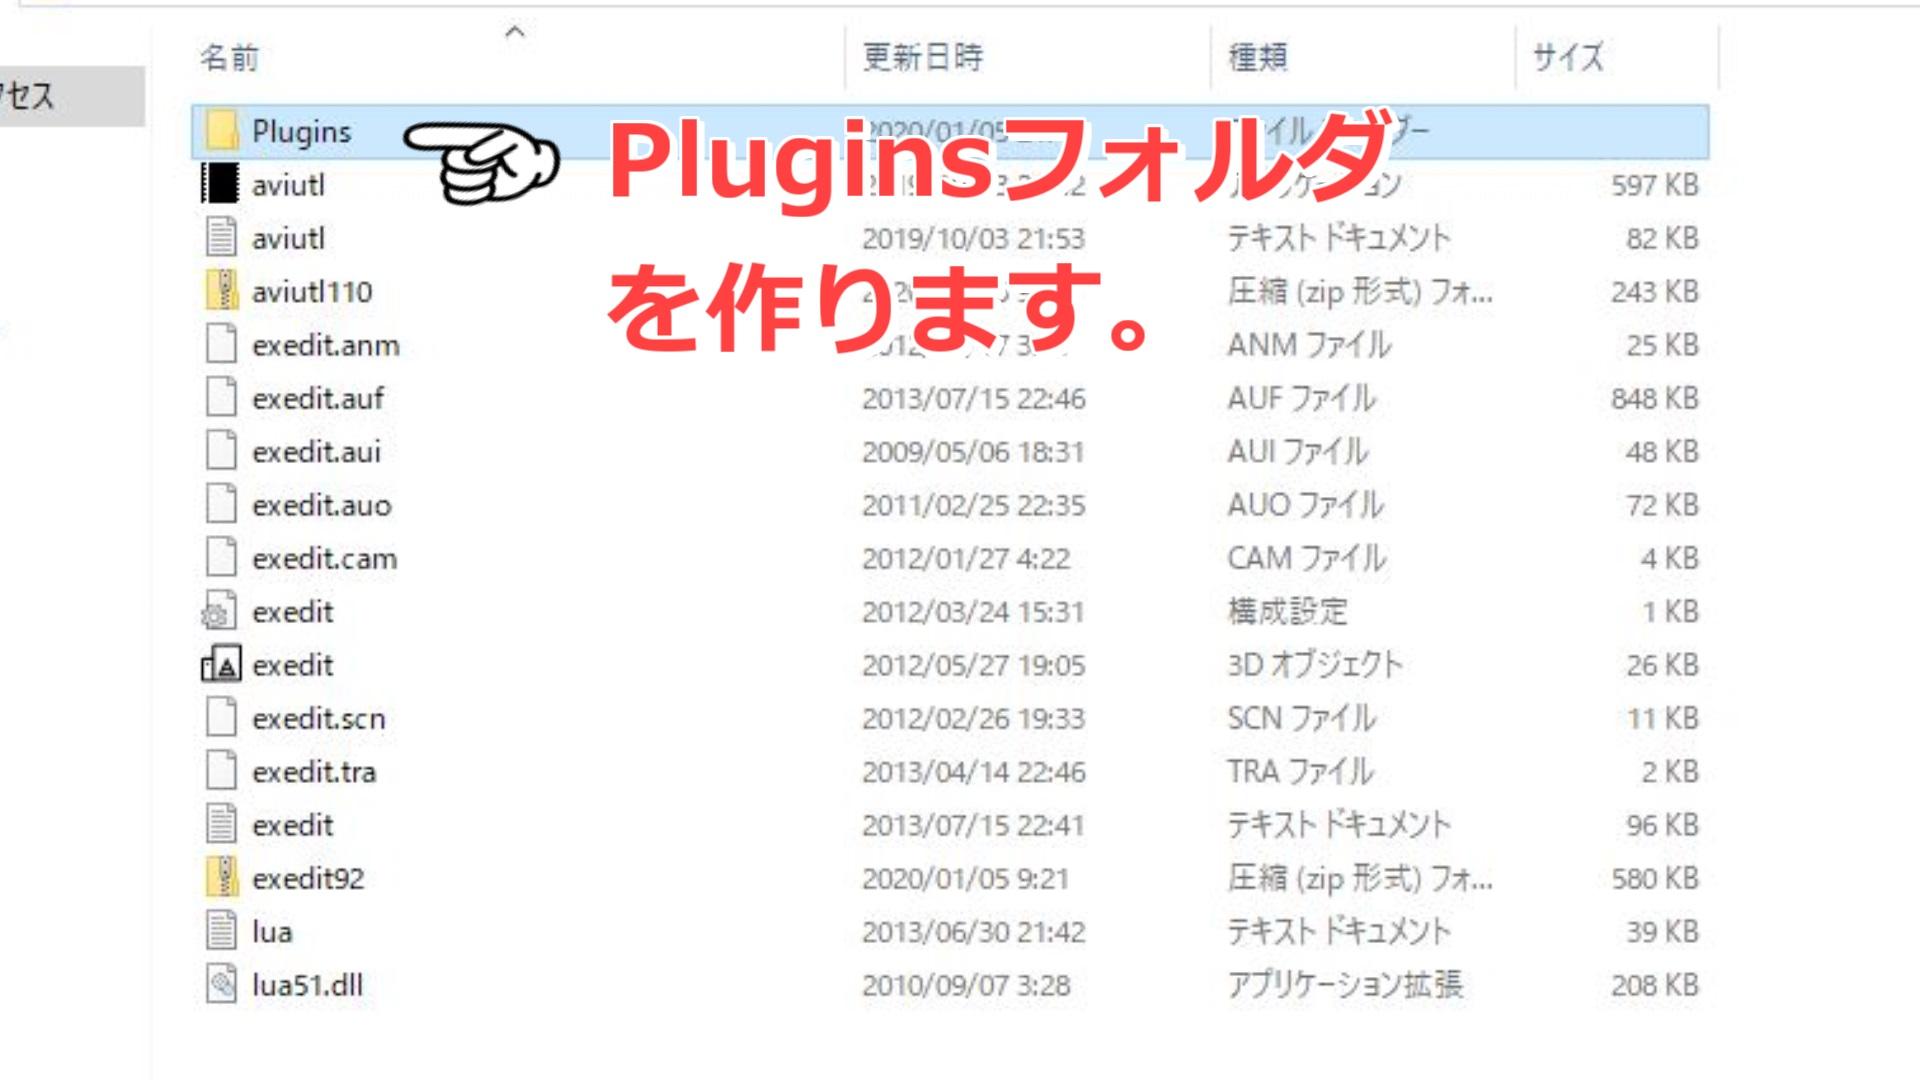 Pluginsという名前のフォルダを作成する